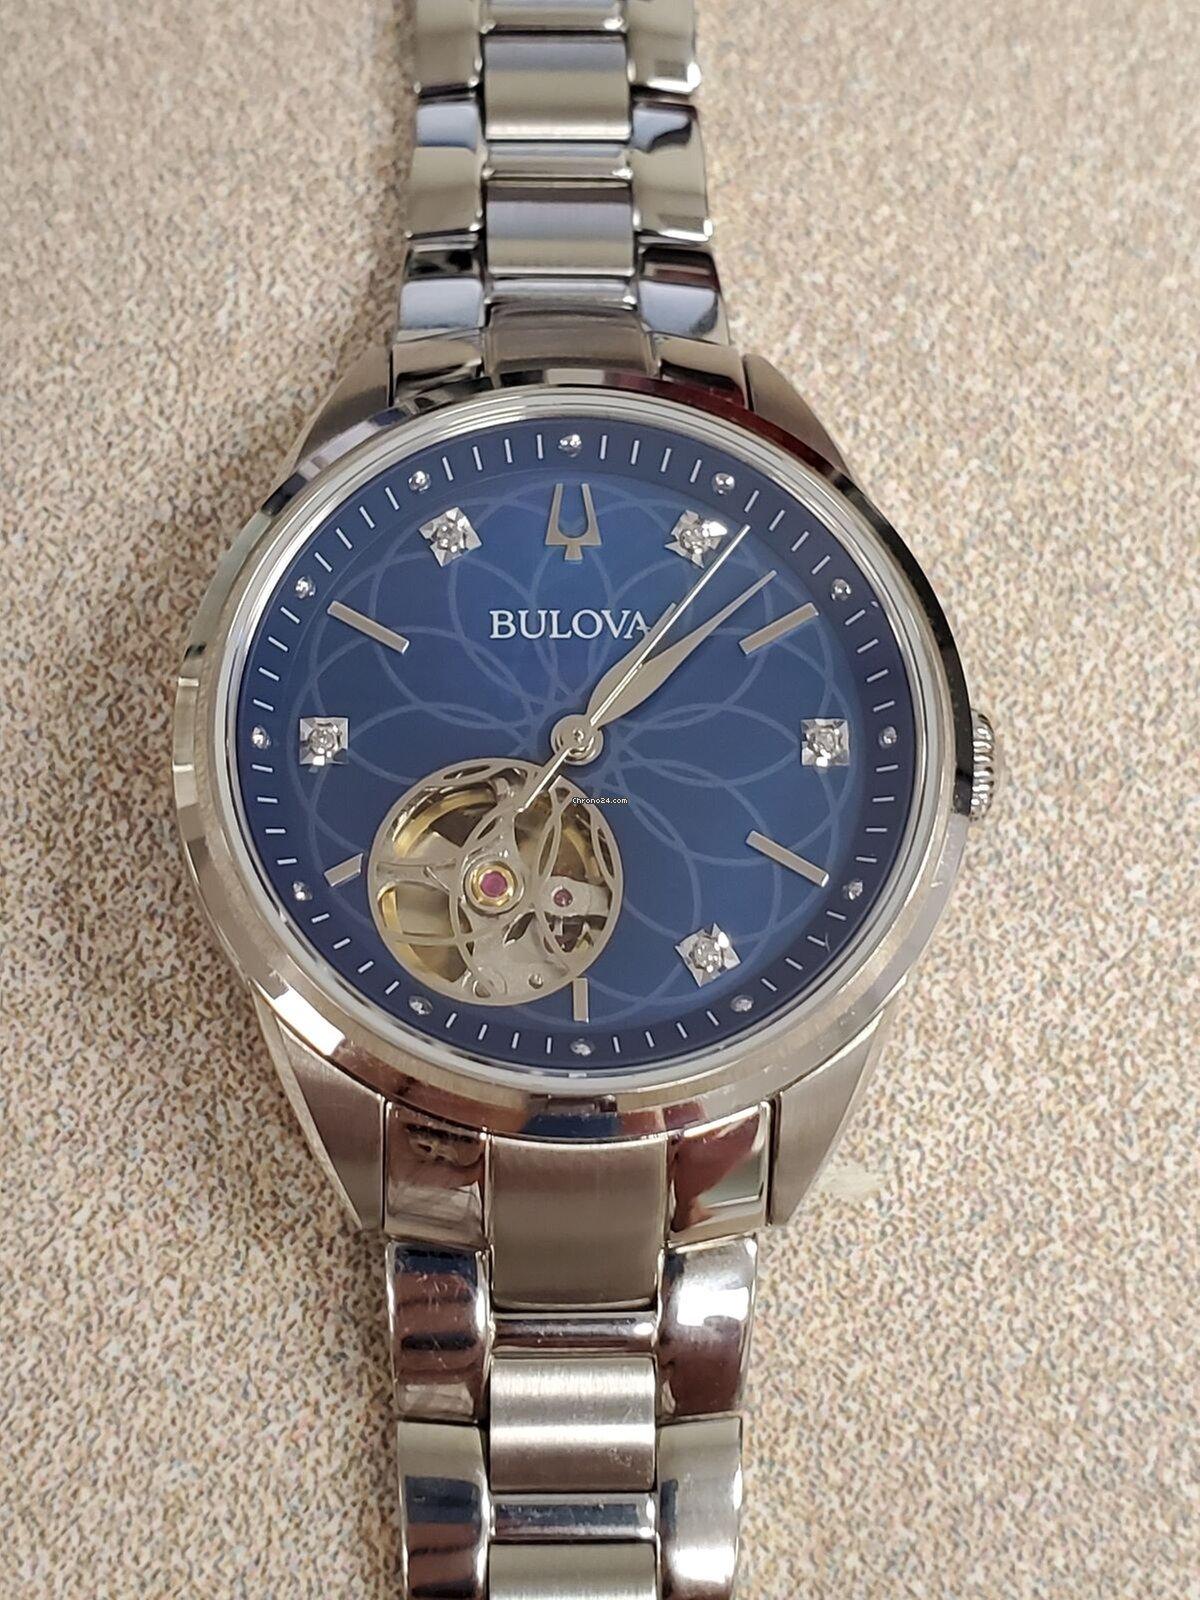 96p191 Für Blue Movement Sutton Watch Bulova Automatic Dial Ladies 0w8nOPk